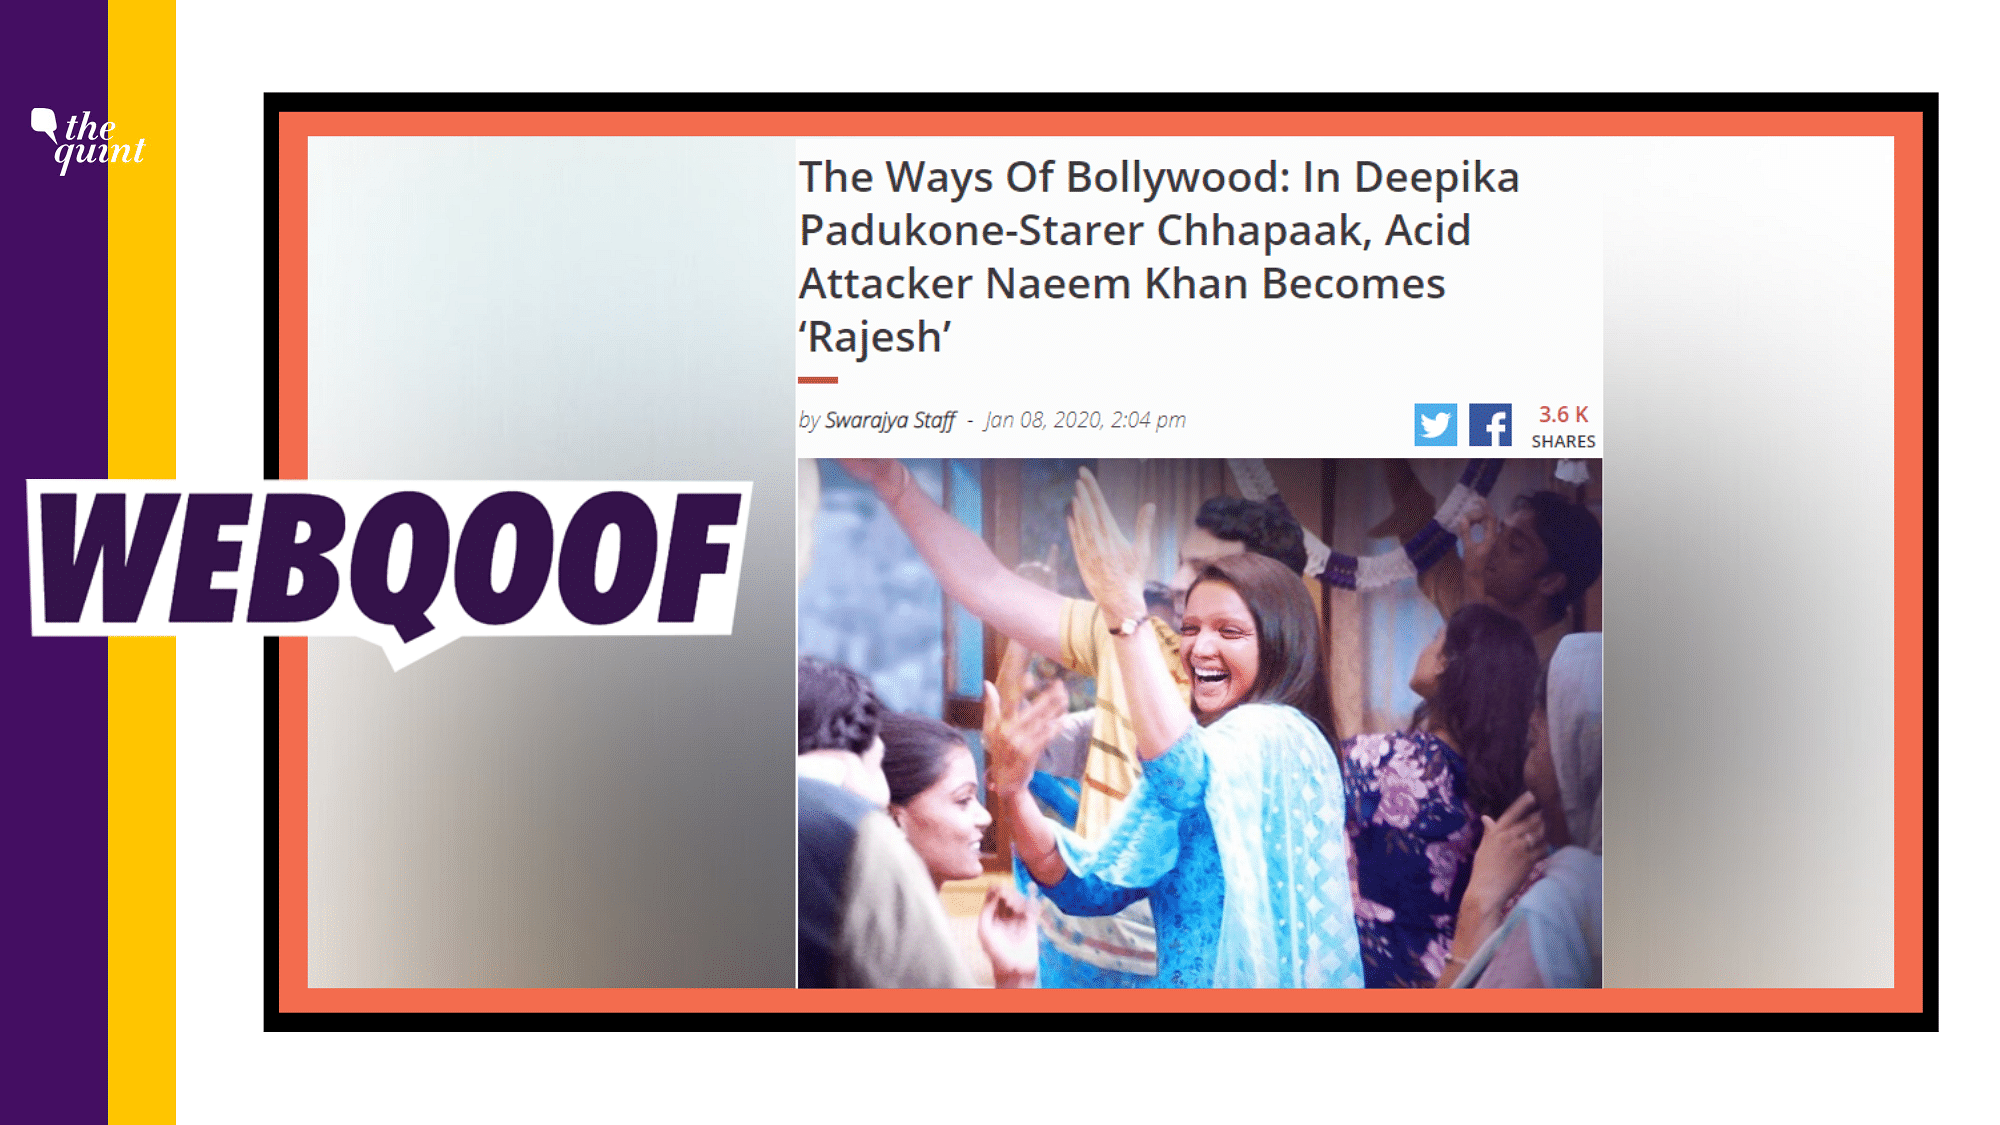 Chhapaak Acid Attacker's Religion Changed? Swarajya Gets It Wrong